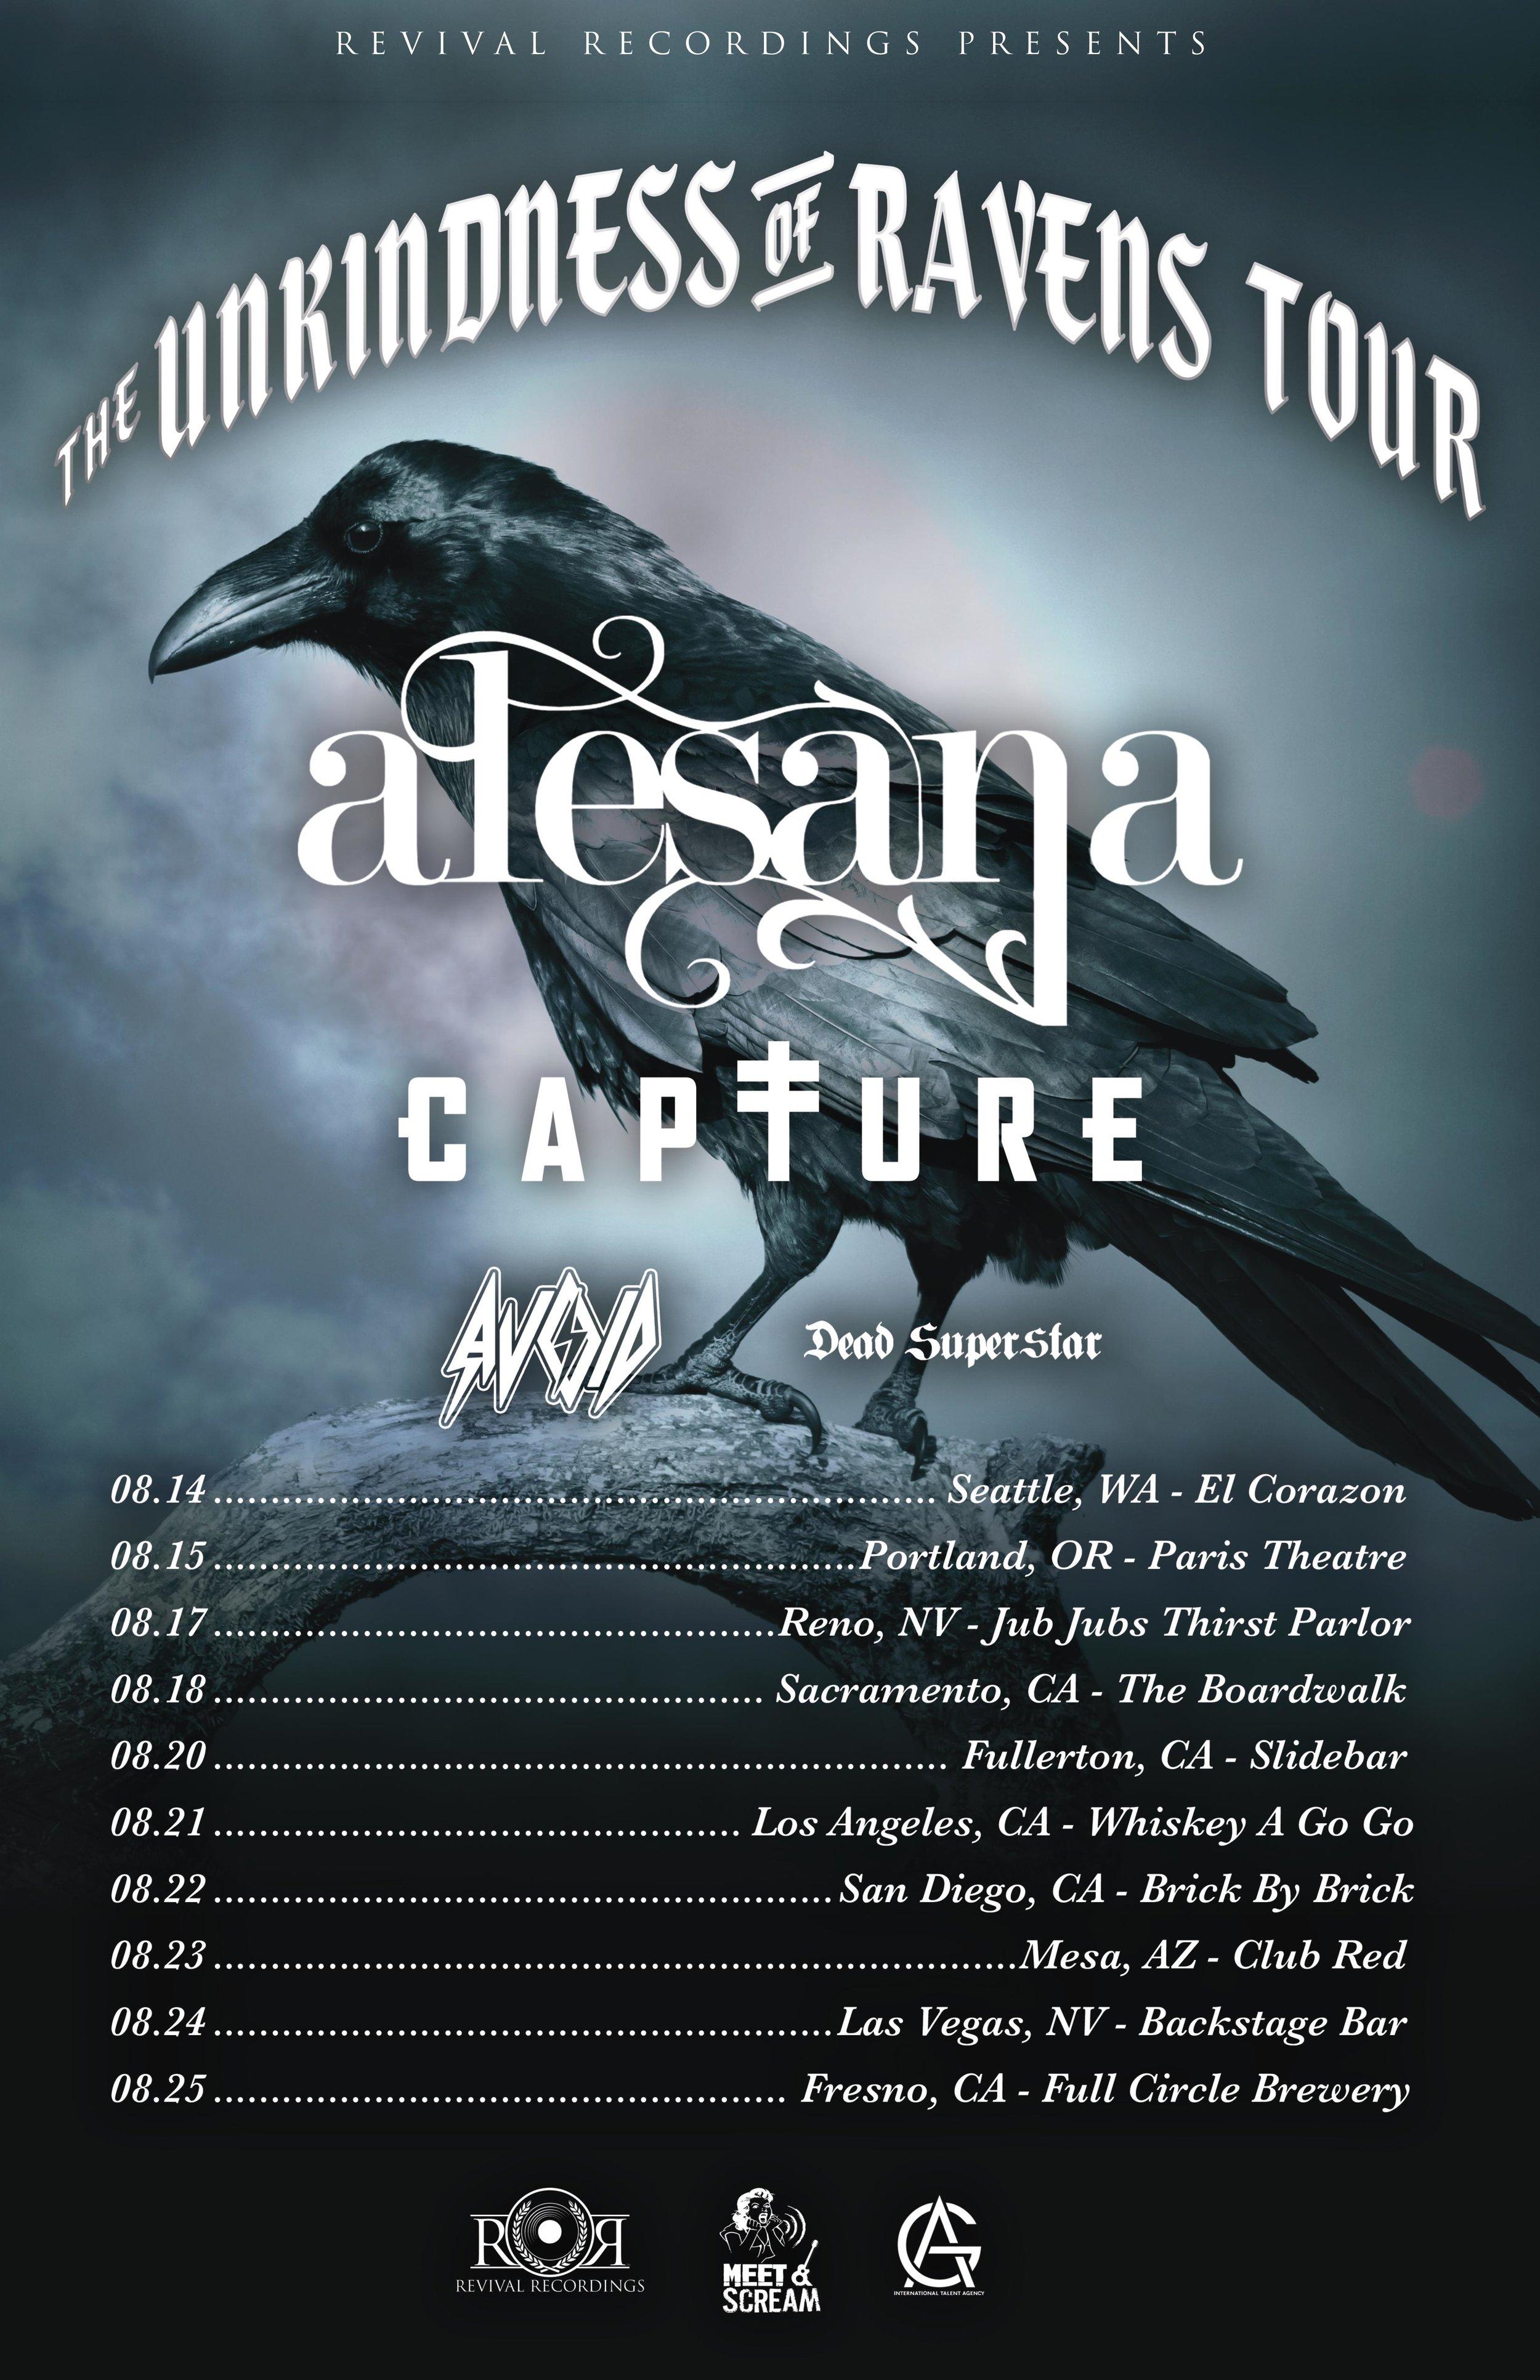 Alesana - Unkindness of Ravens Tour.jpg